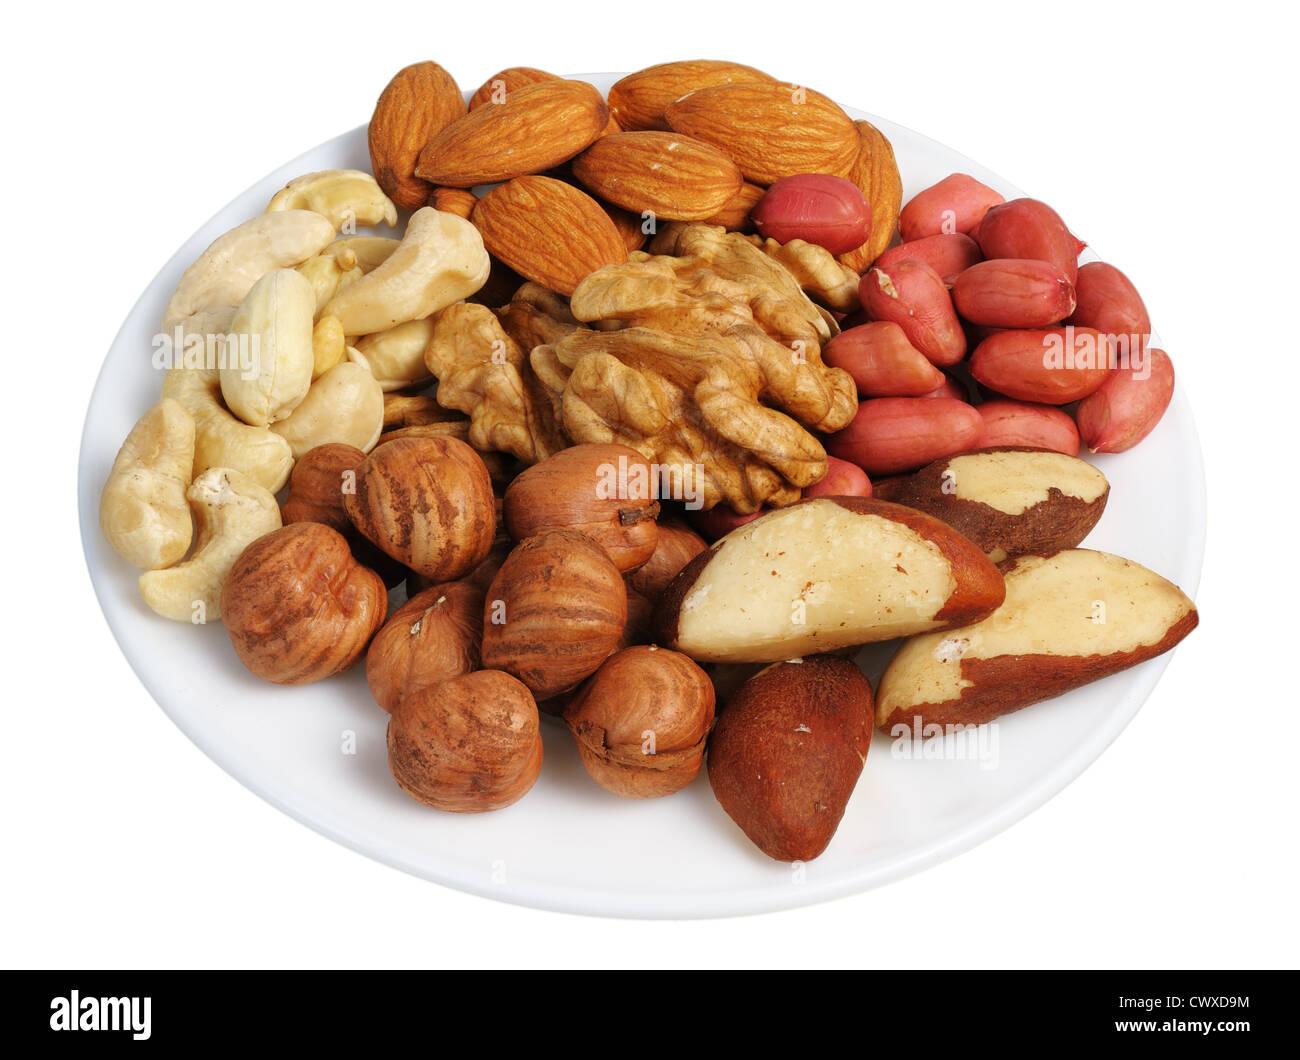 foto Are Brazil Nuts The Next Almonds